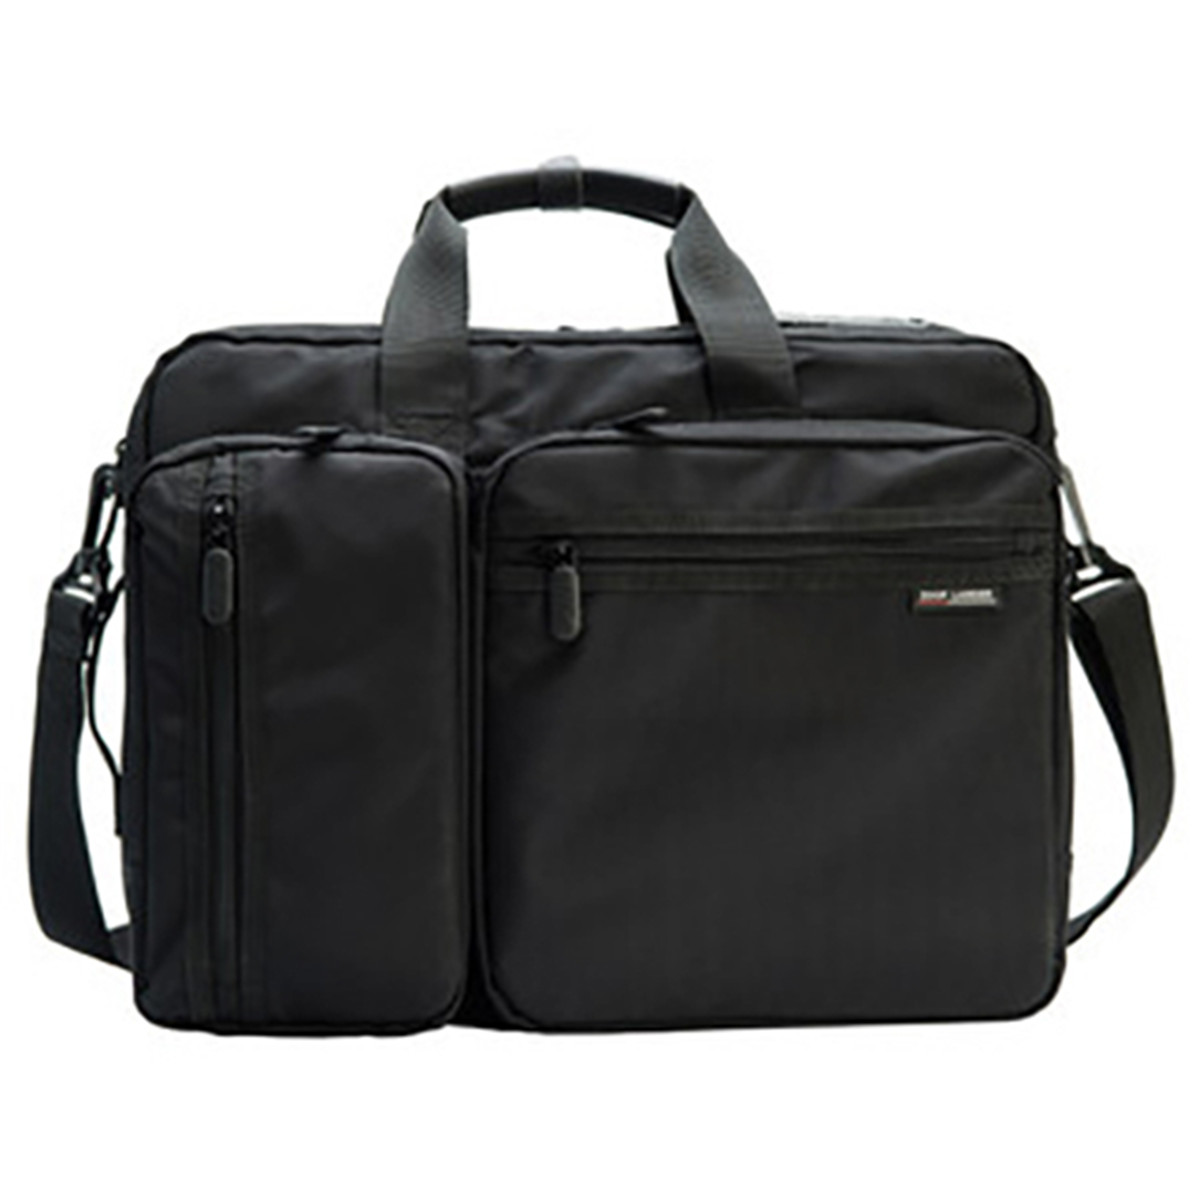 Osmond Men Anti-theft Briefcase Expandable Multi-pocket Waterproof Laptop Bag Large Capacity Travel Bags Multipurpose Handbags